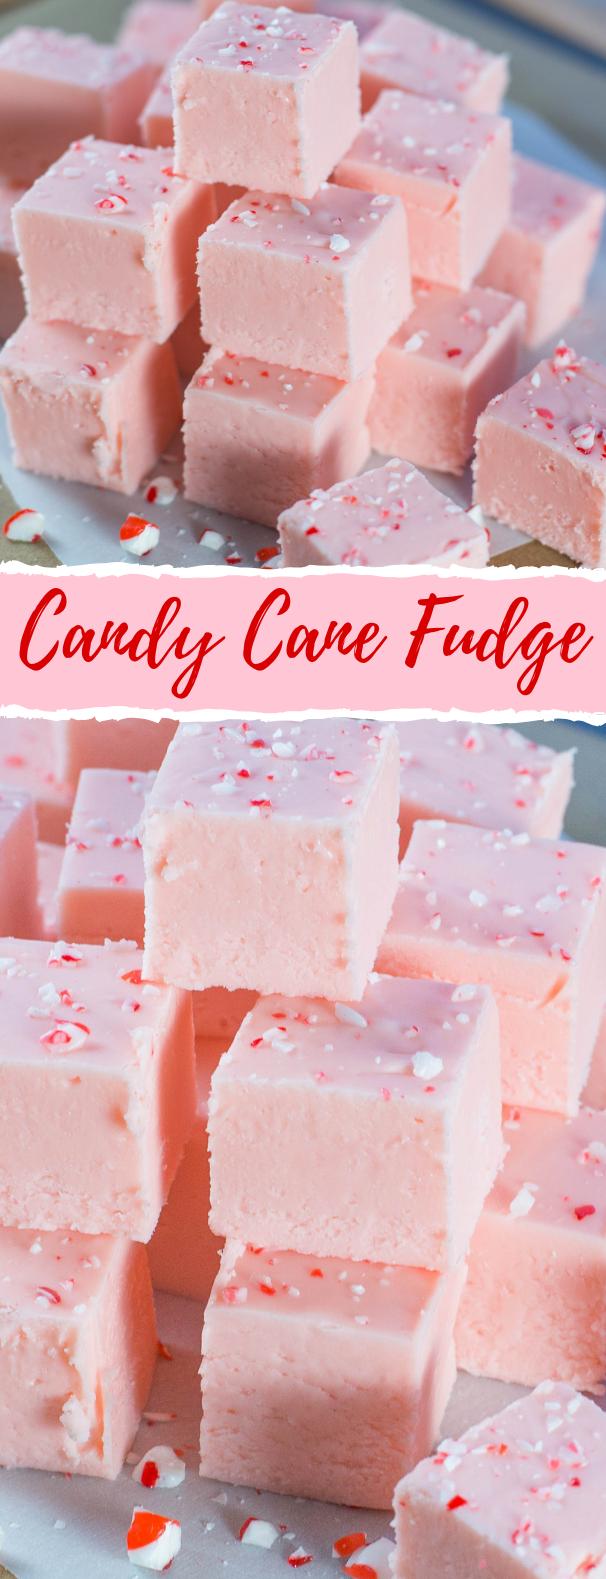 Candy Cane Fudge #Sugar #Candies